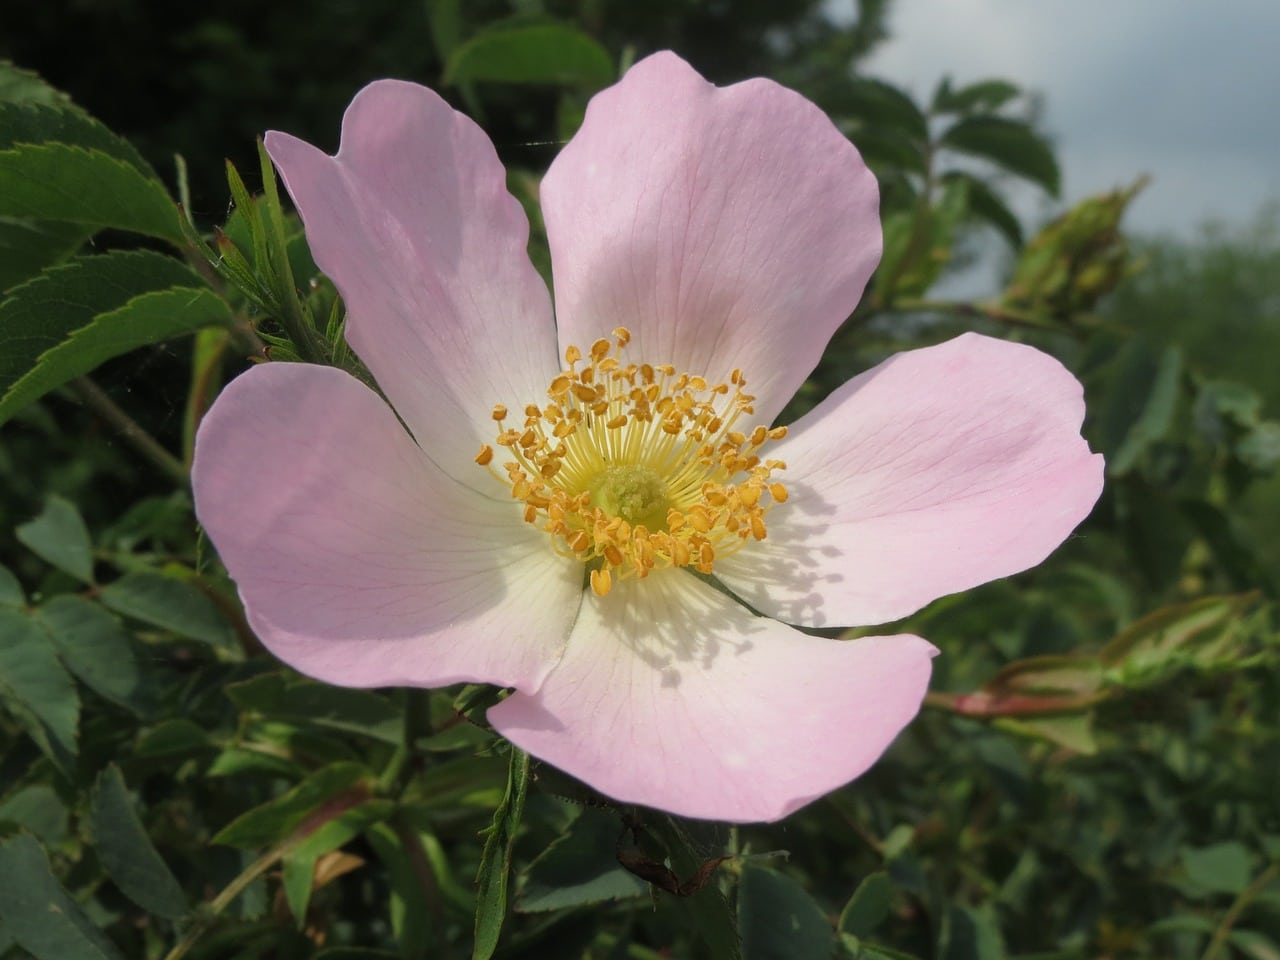 secrets of the bach flower remedy plants 36 wild rose. Black Bedroom Furniture Sets. Home Design Ideas